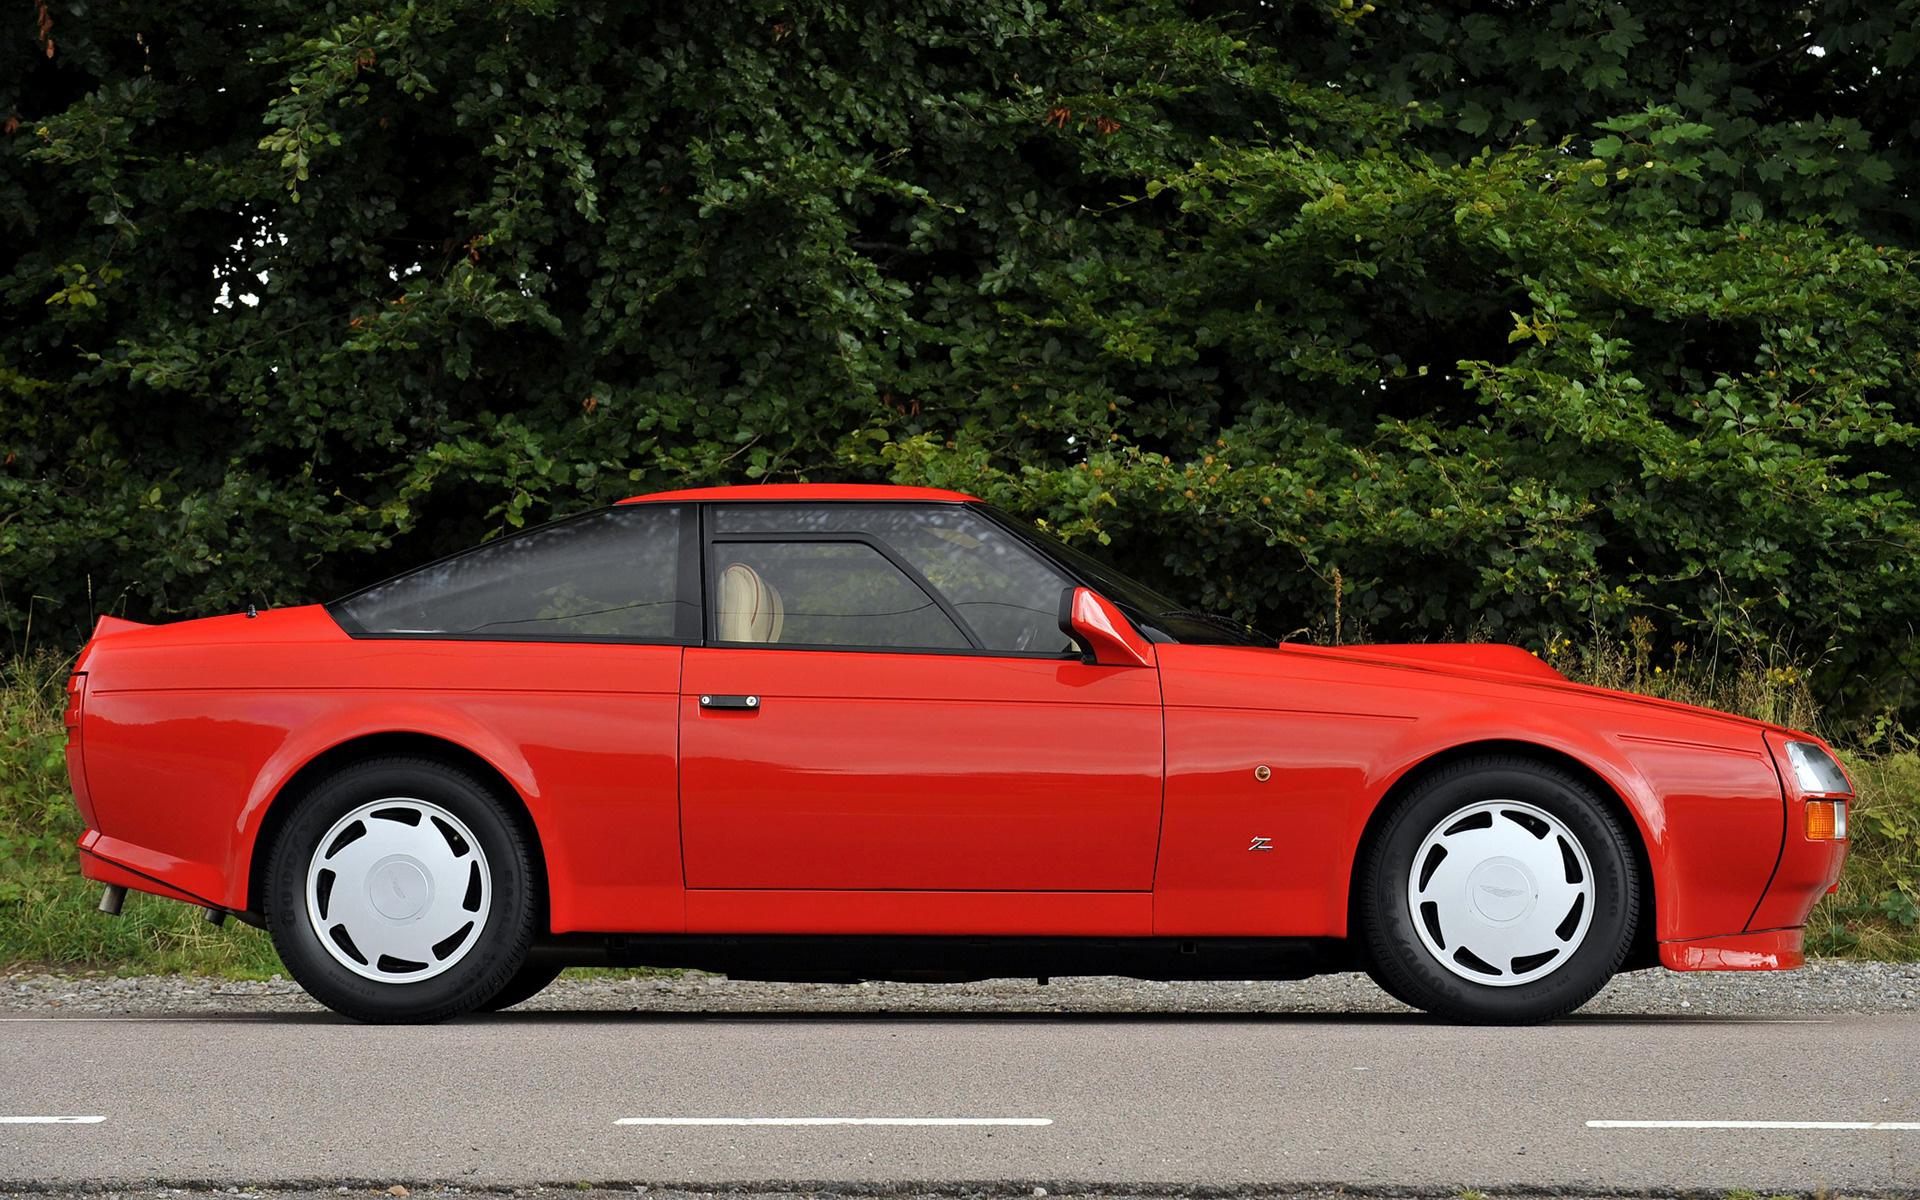 1986 Aston Martin V8 Vantage Zagato Uk Wallpapers And Hd Images Car Pixel